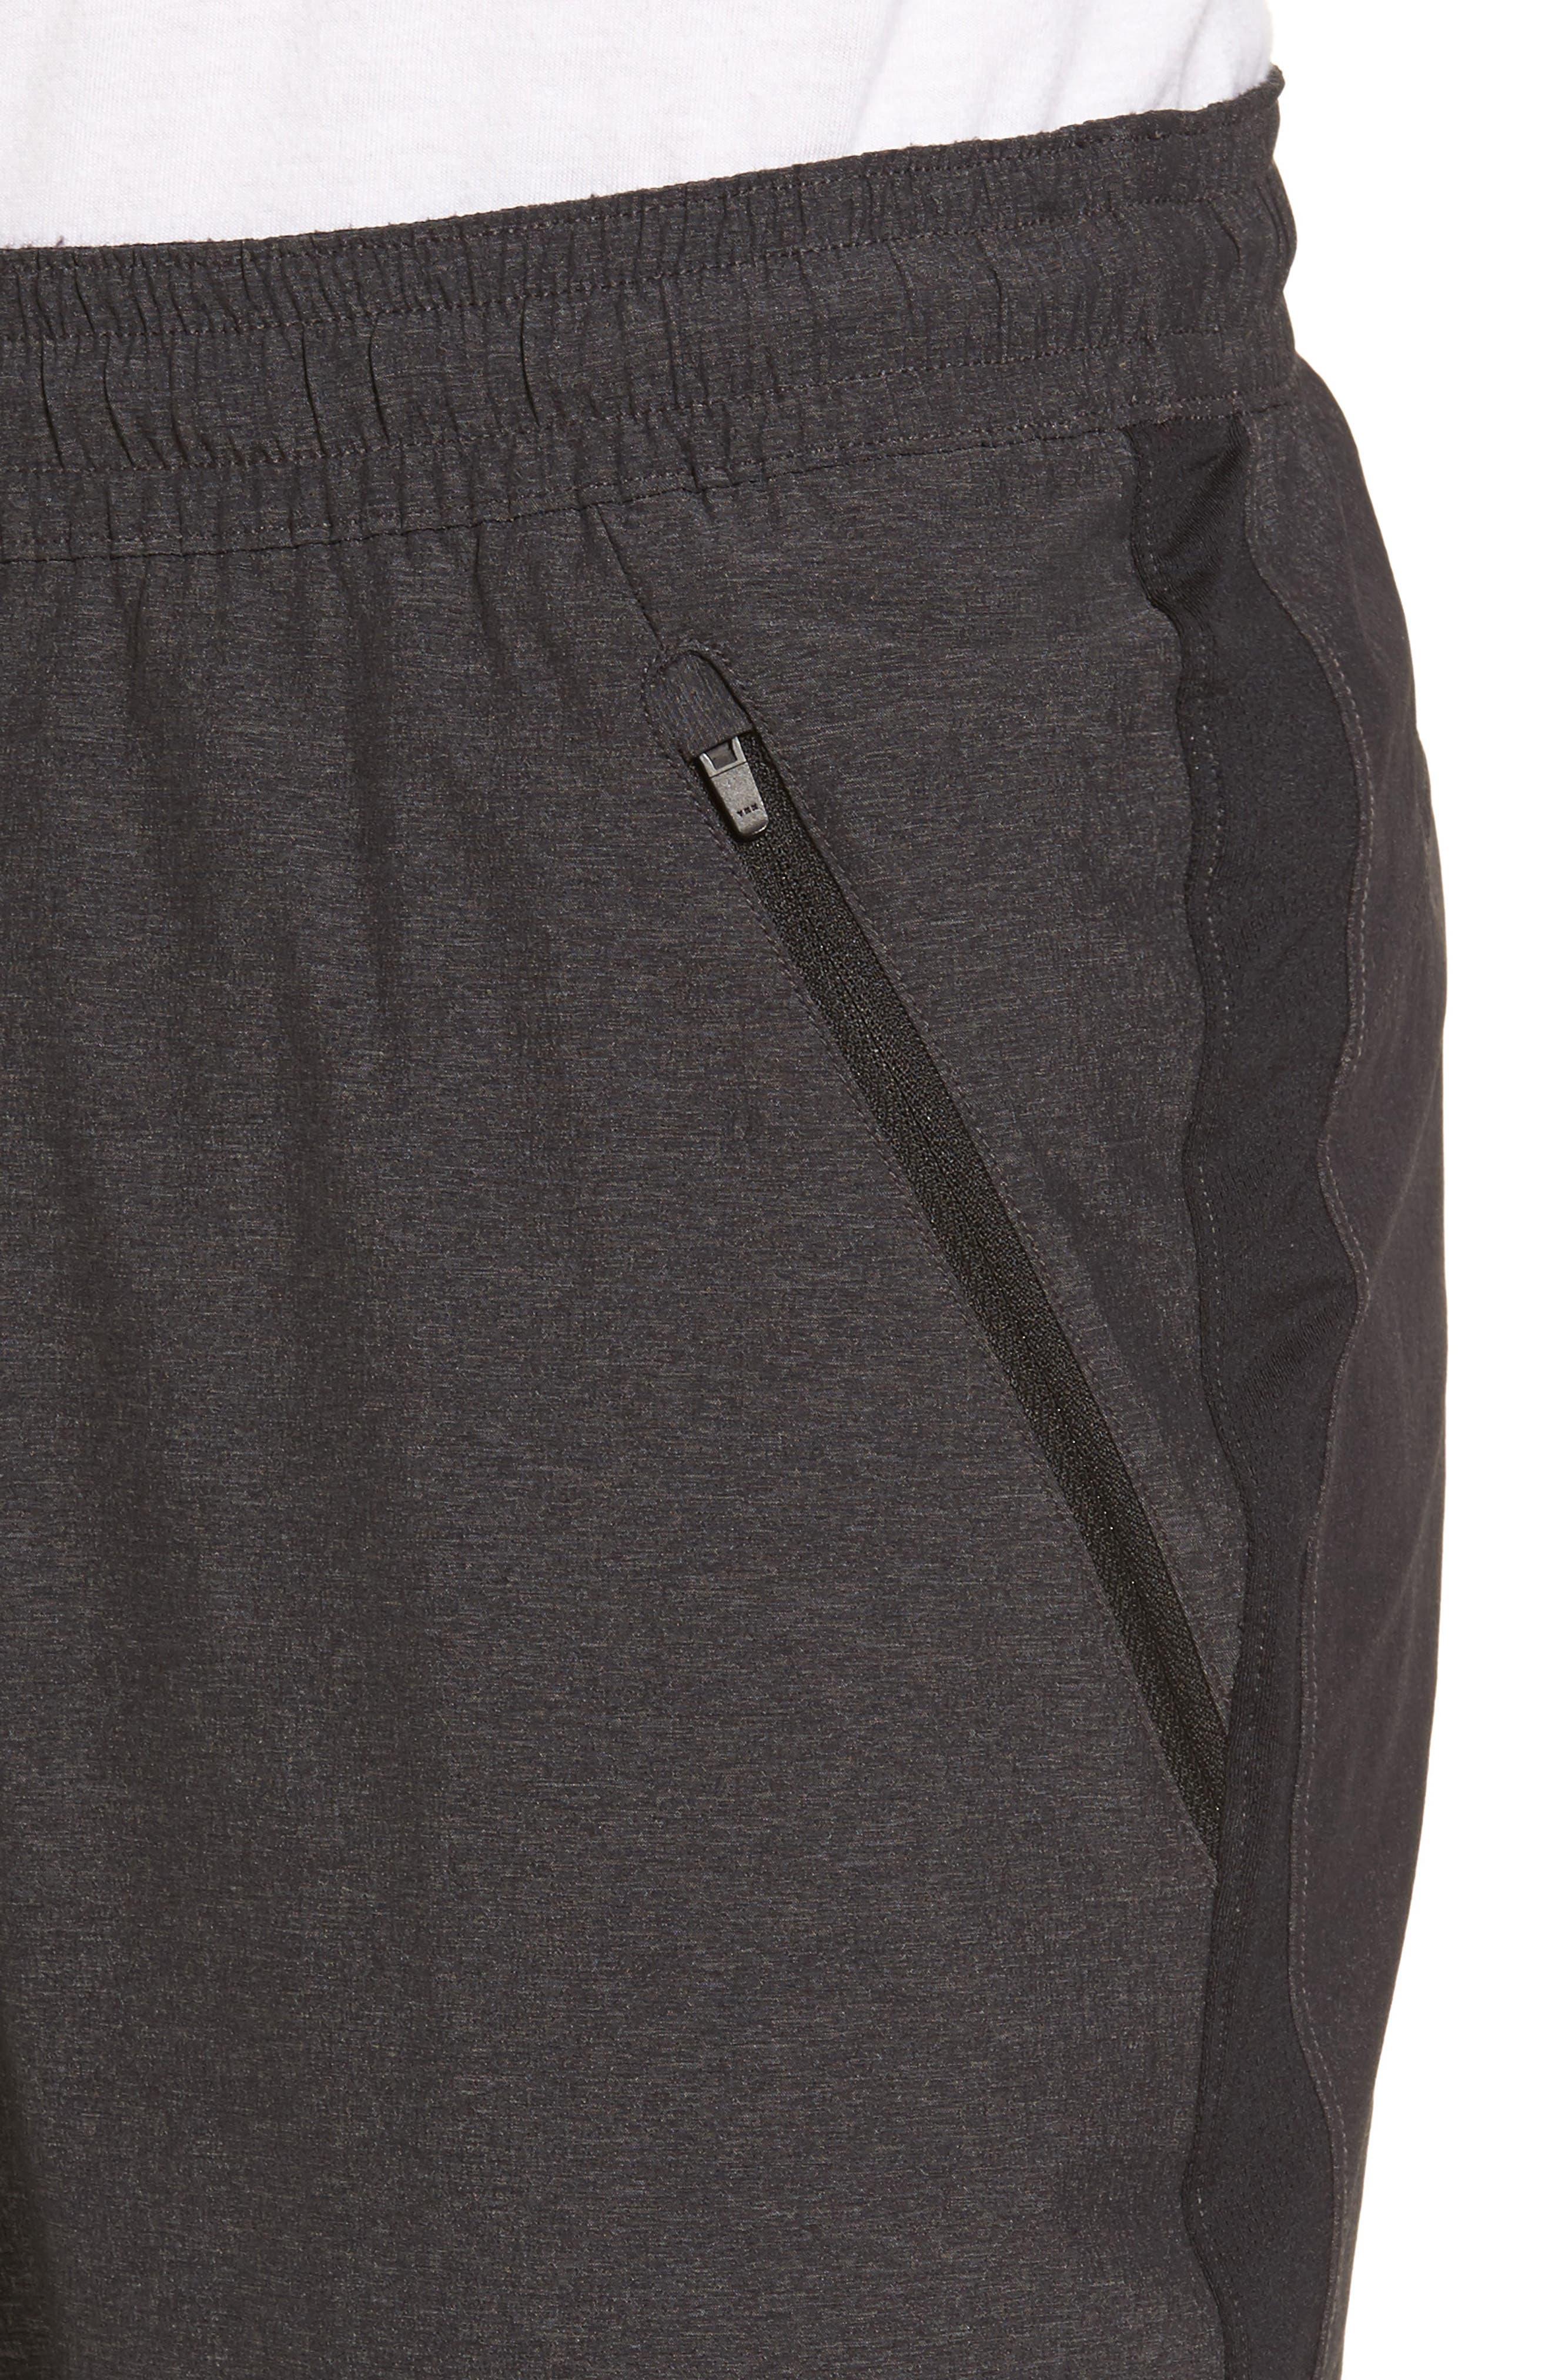 Zip Pocket Sweatpants,                             Alternate thumbnail 4, color,                             Grey Ebony Melange